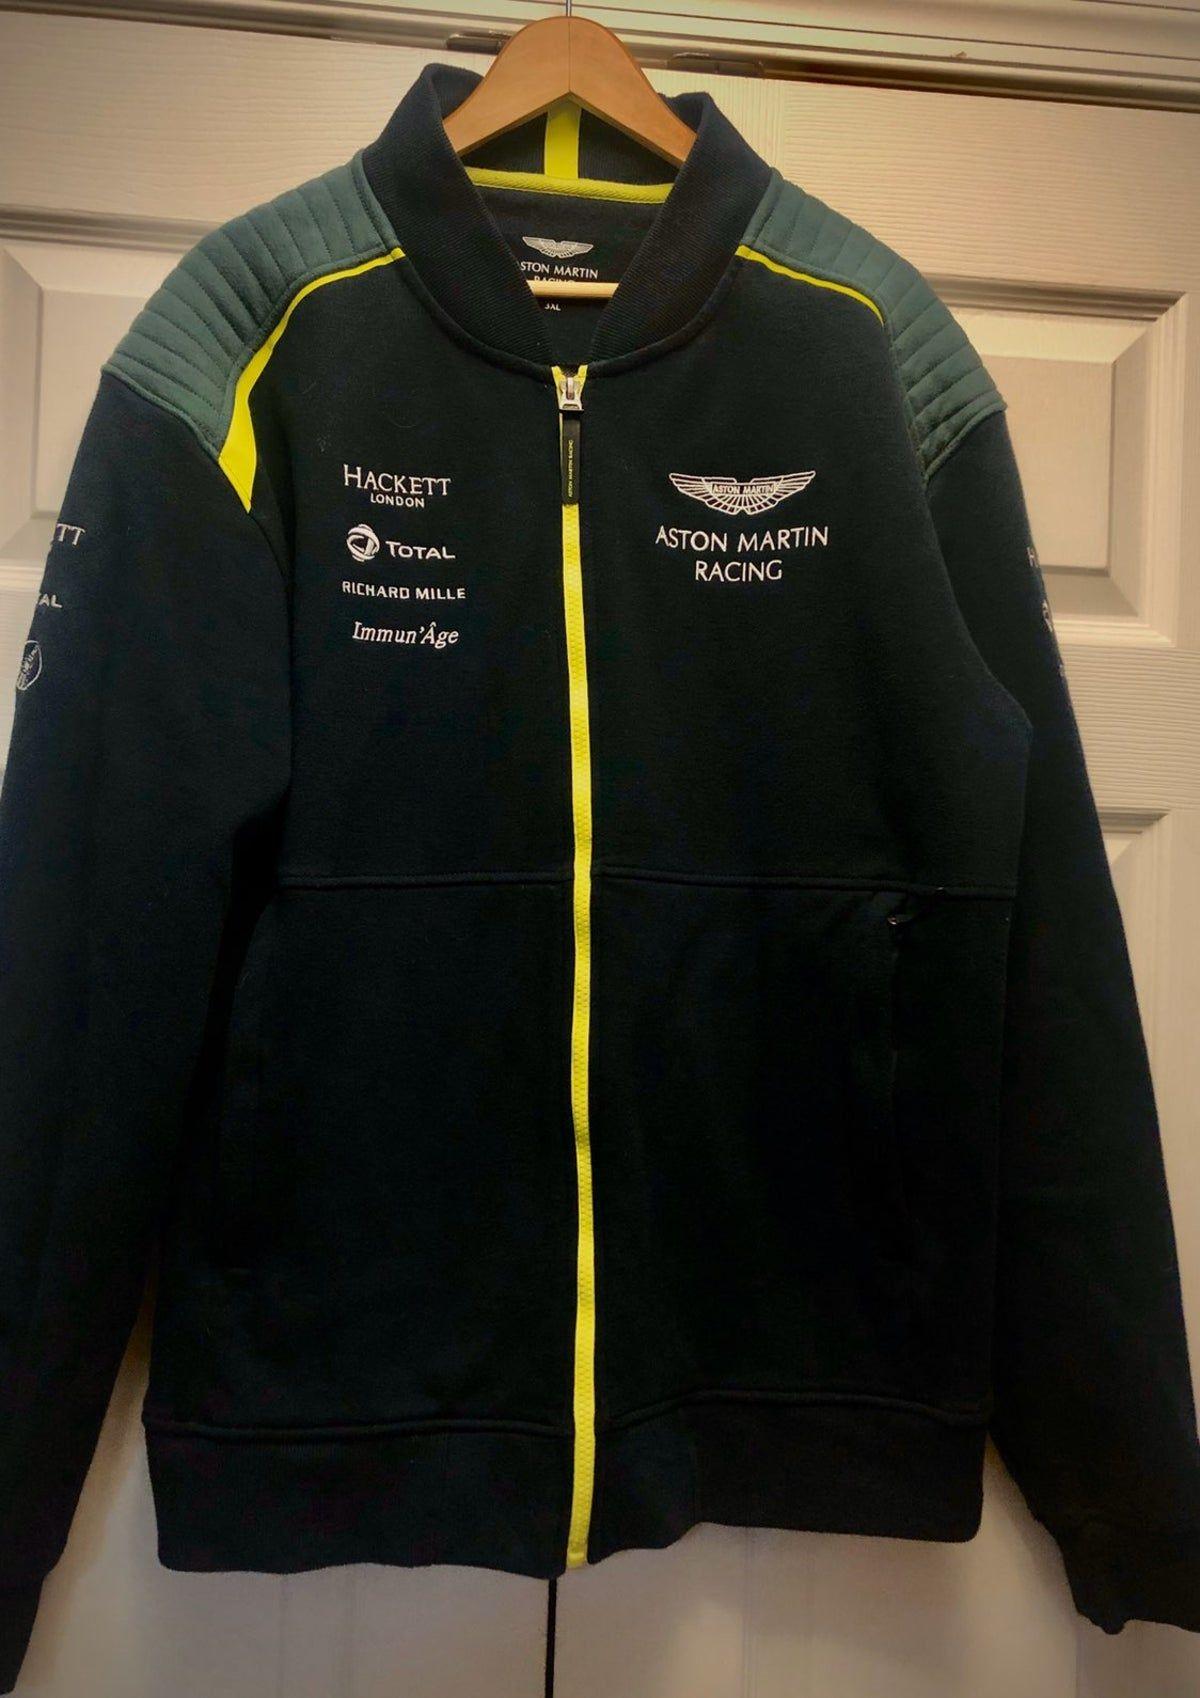 Men S Aston Martin Racing Jacket On Mercari Jackets Sweatshirt Jacket Sweatshirts